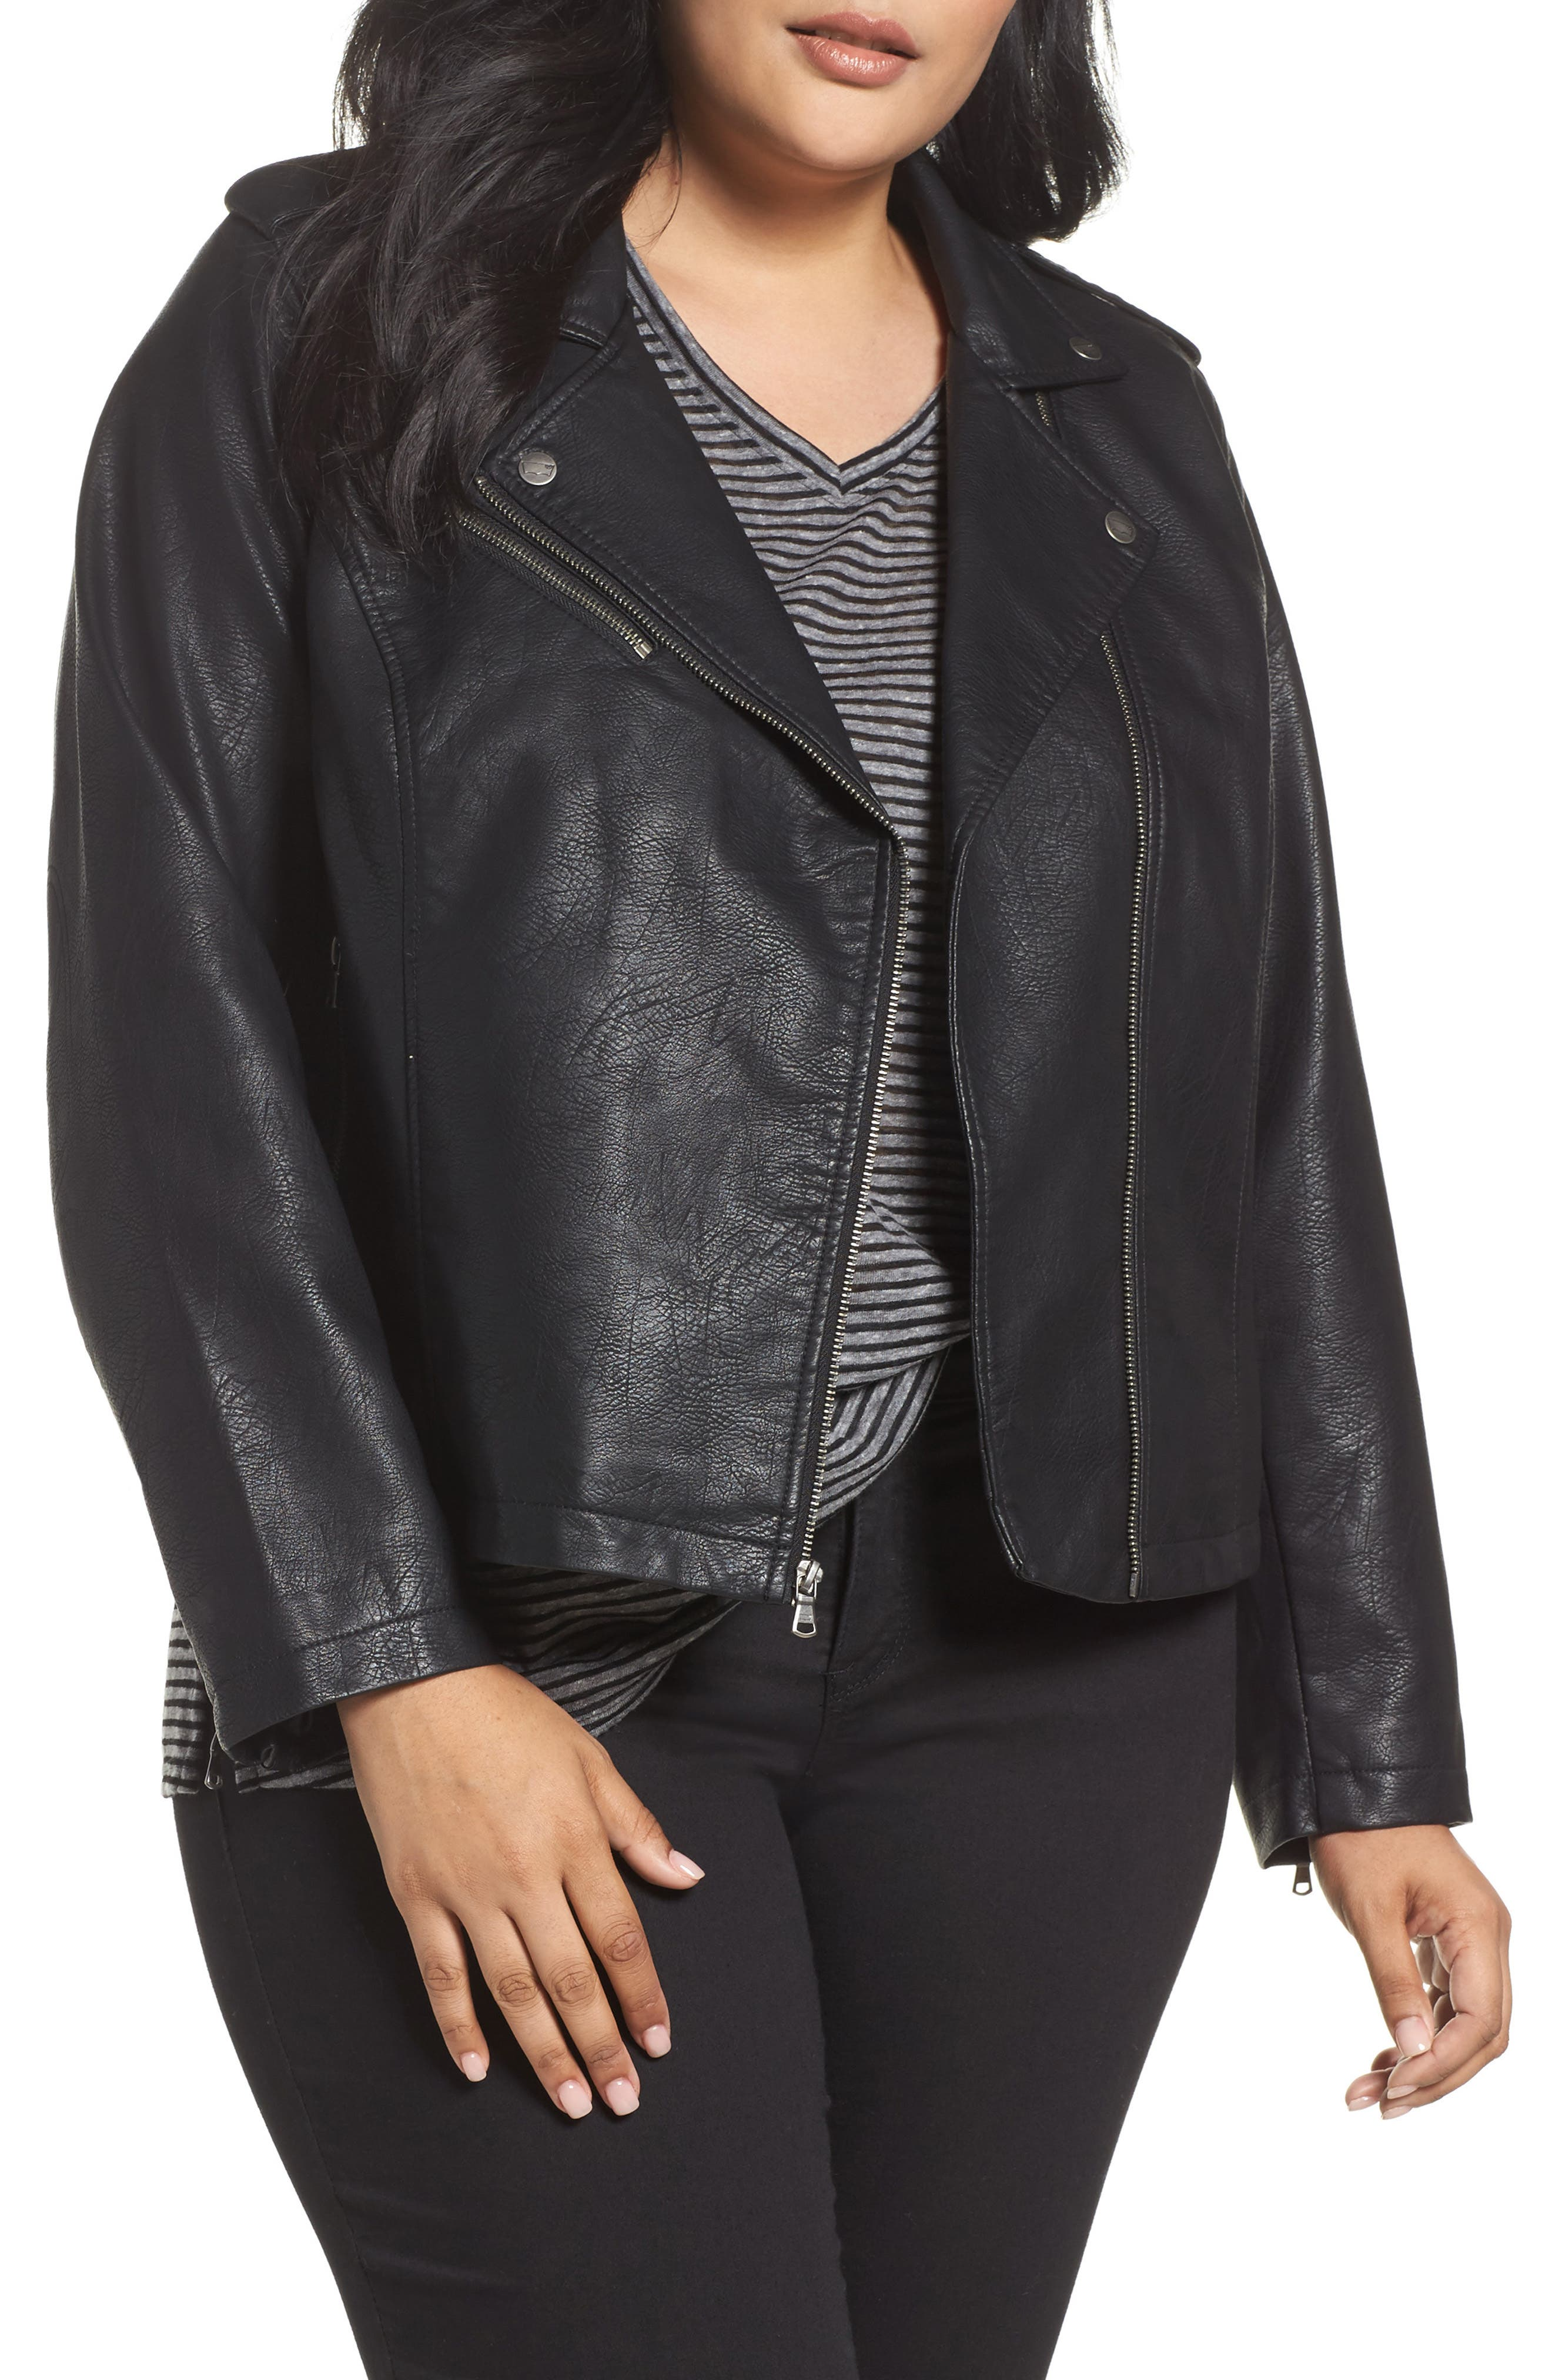 Alternate Image 1 Selected - Levi's® Faux Leather Jacket (Plus Size)